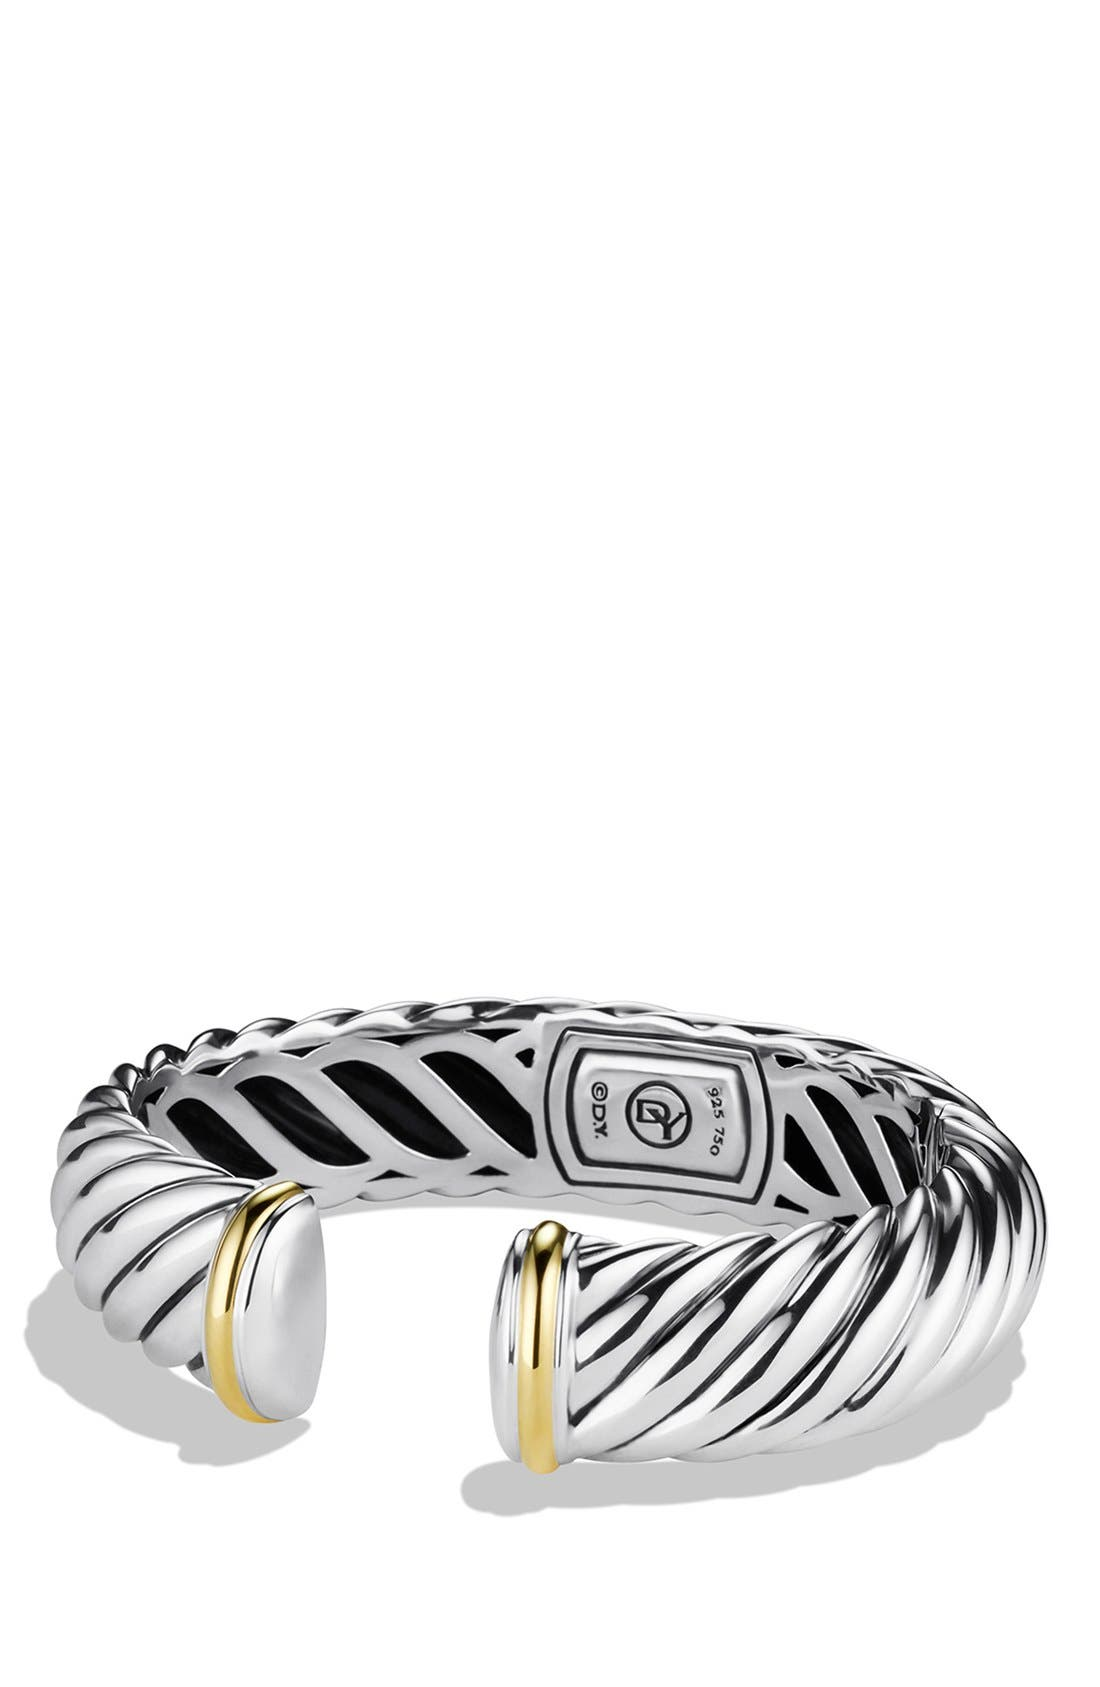 David Yurman 'Waverly' Bracelet with Gold